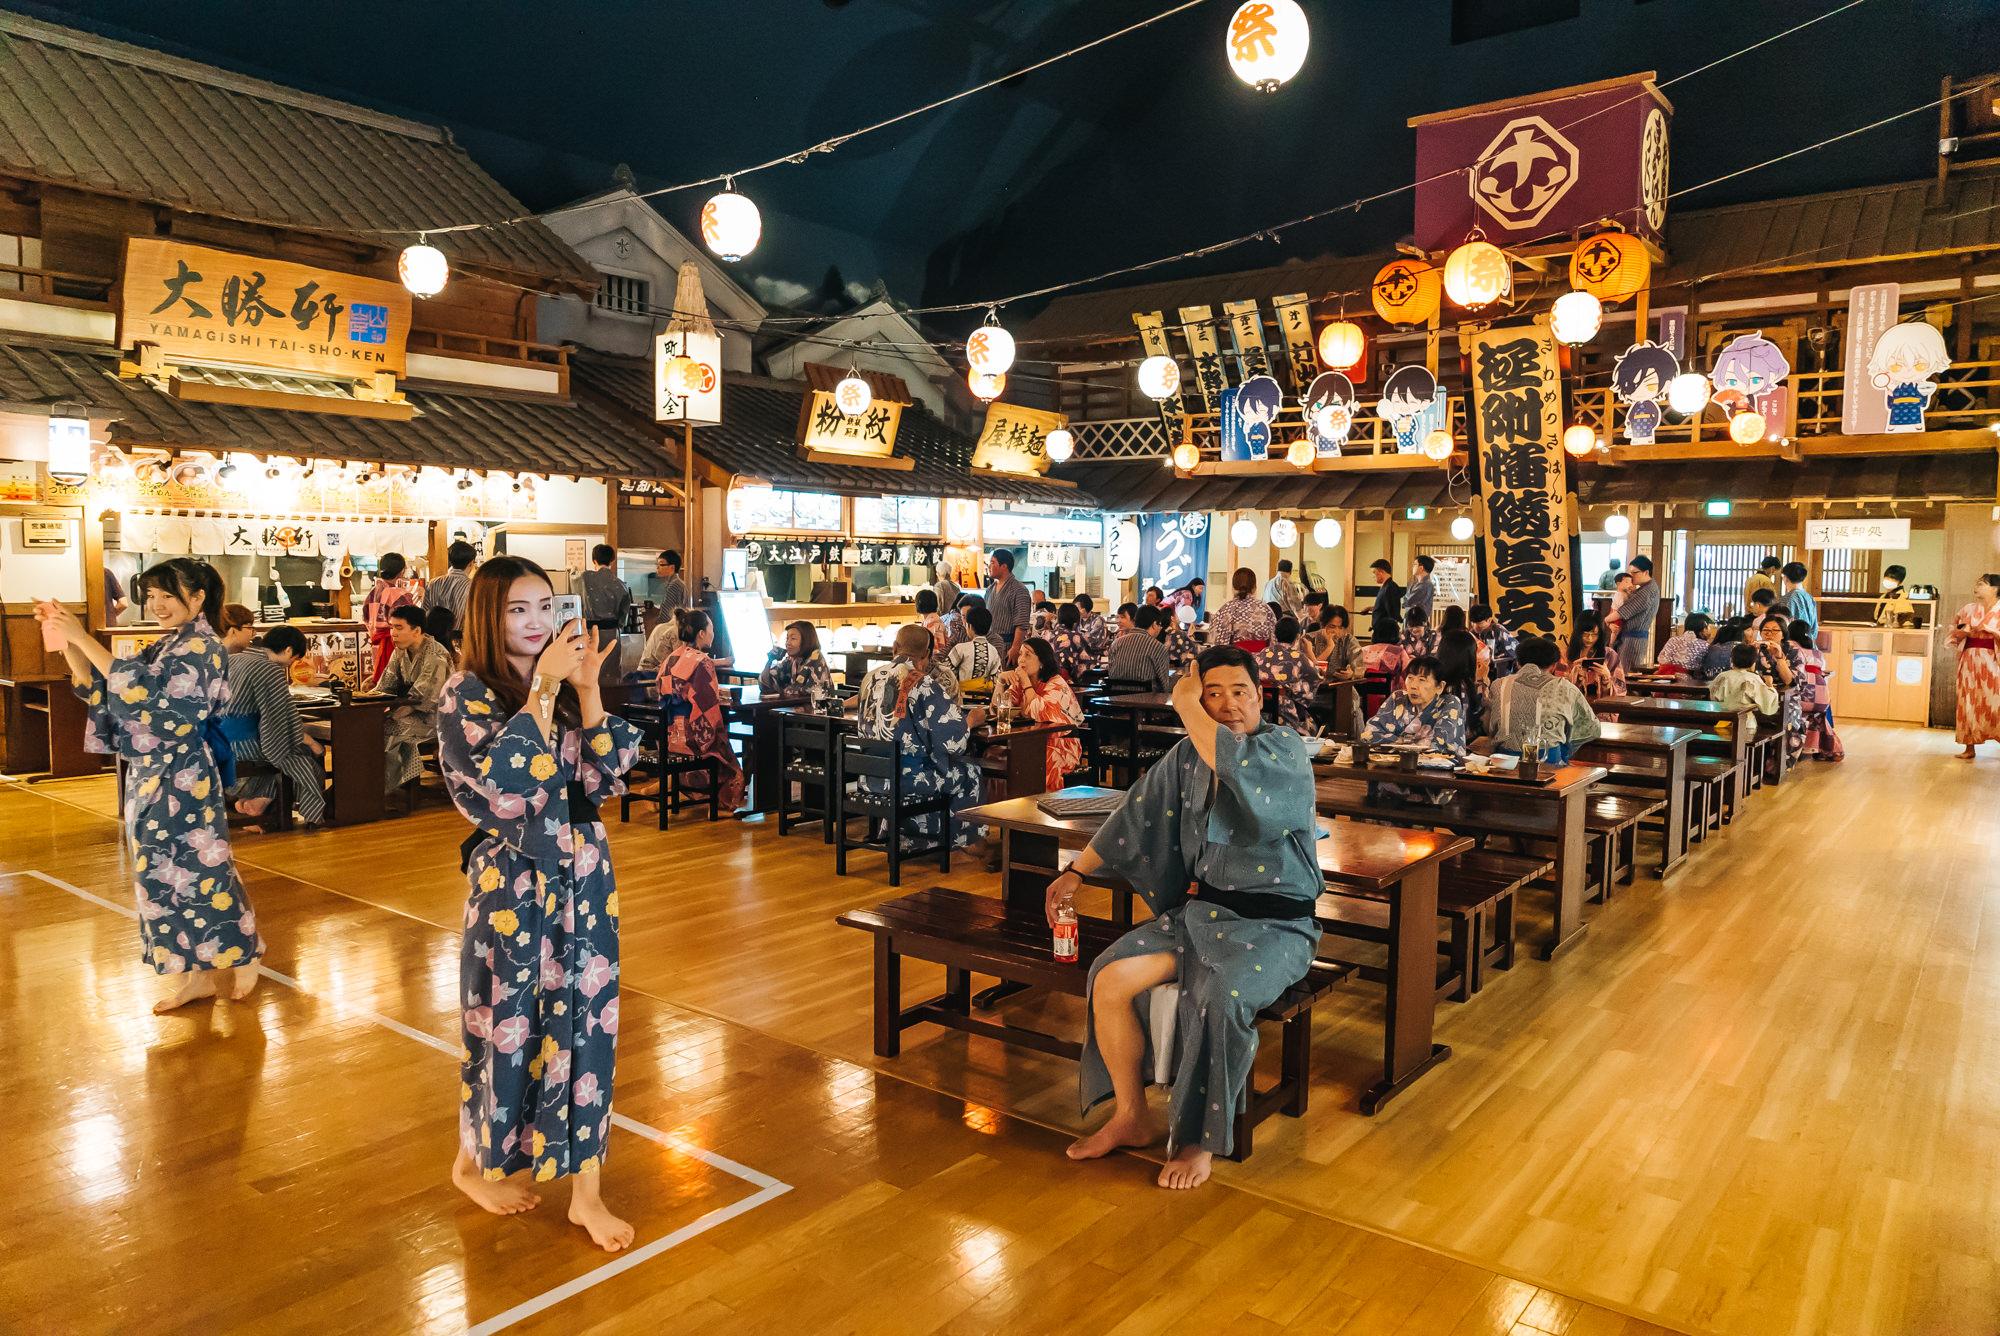 Dining area of Oedo Onsen